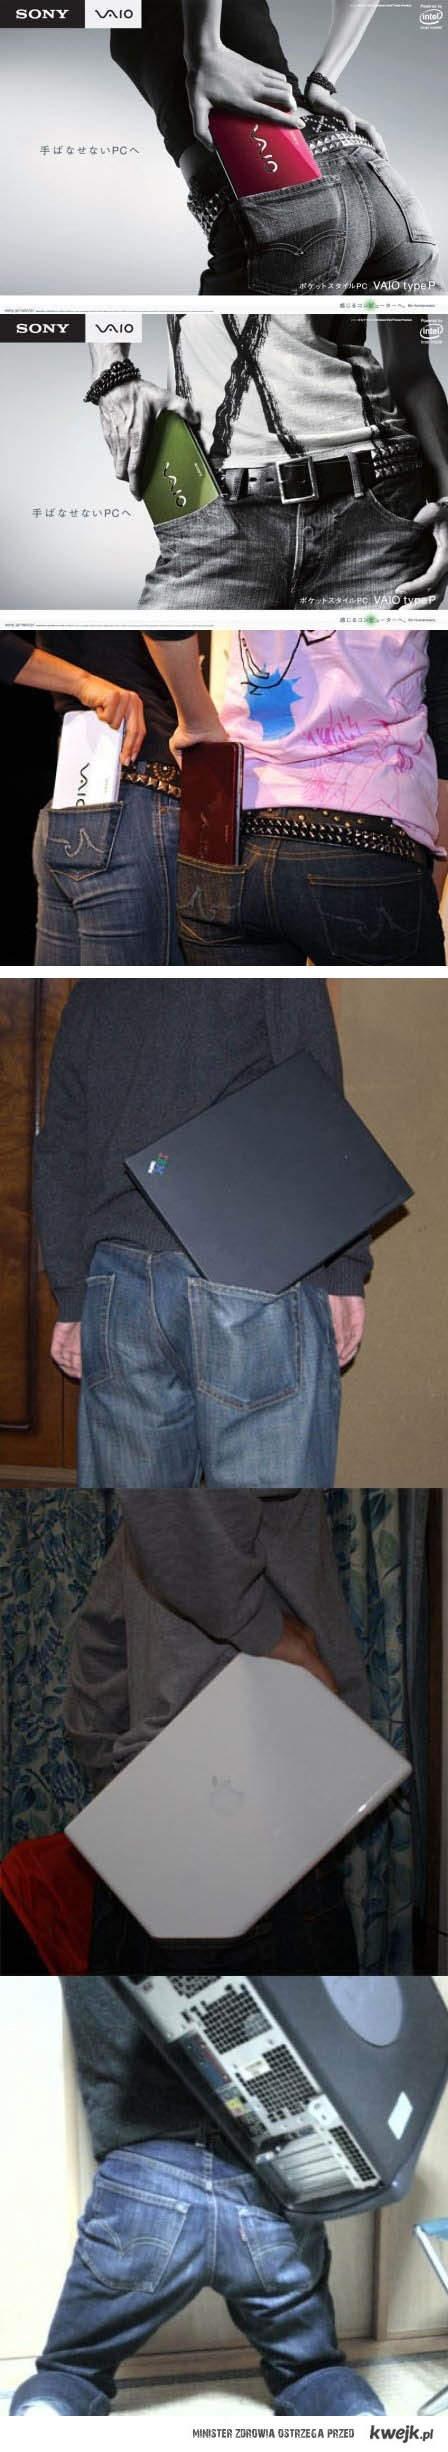 Kieszonkowe komputery